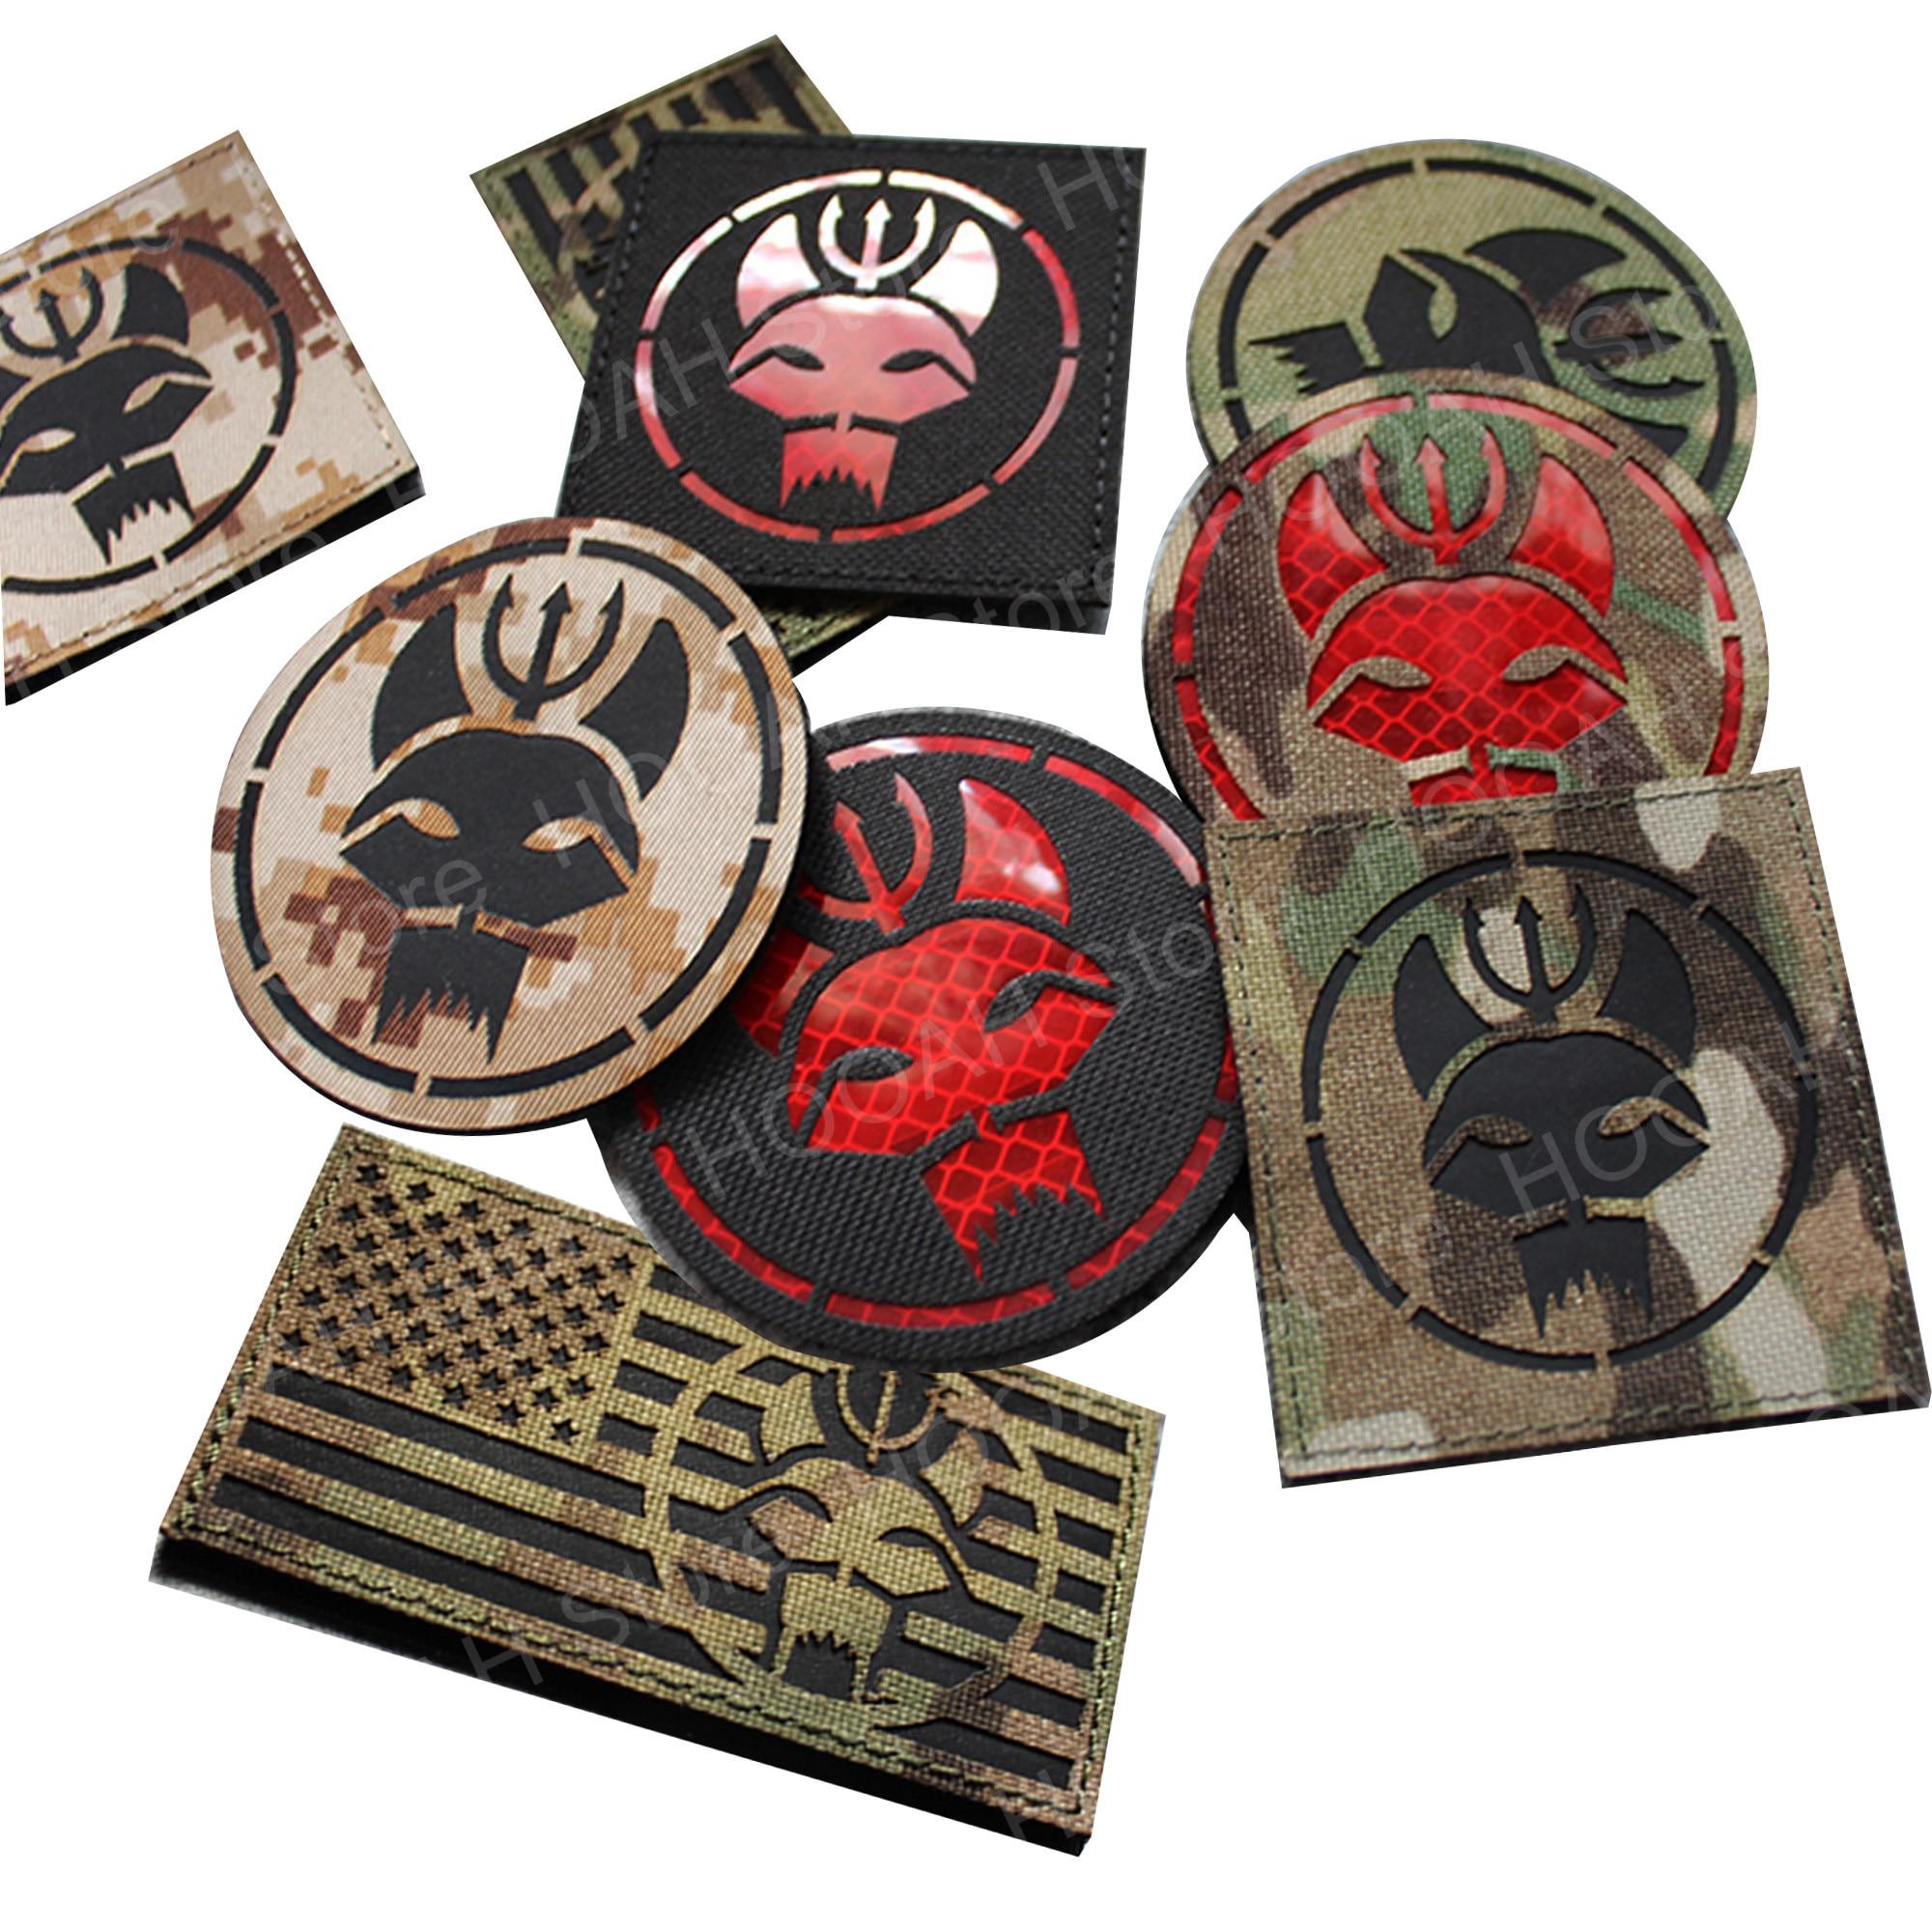 Seal Team parche infrarrojo IR Navy Seals SWAT parches invertidos Multicam militar CP camo parche reflectante insignia gancho/bucle